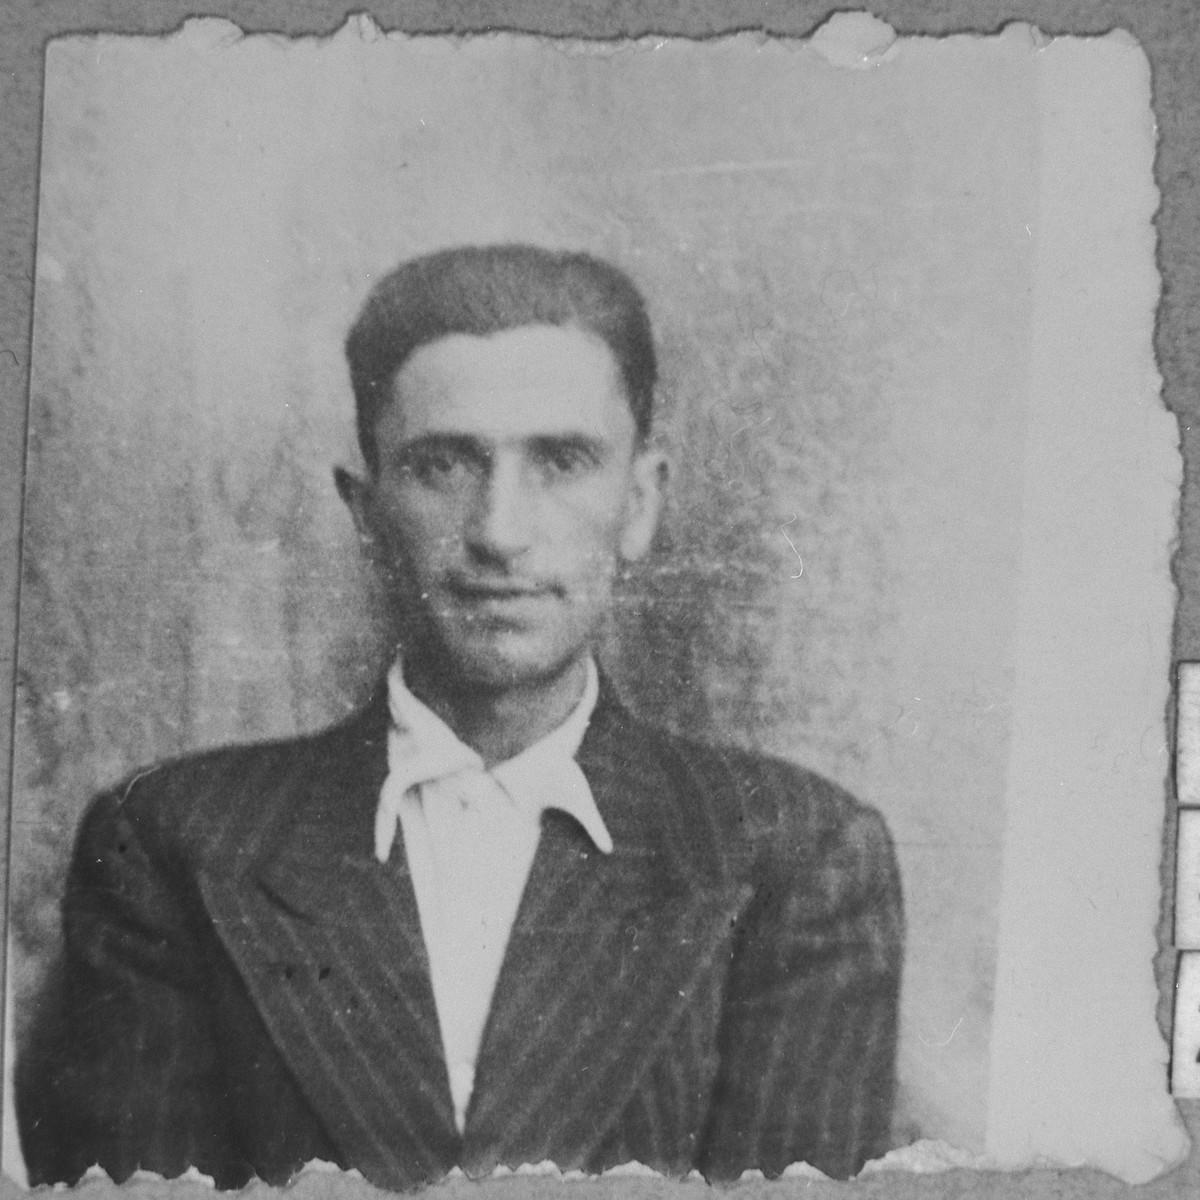 Portrait of Mati Sarfati, son of Mushon Sarfati.  He was a rag dealer.  He lived at Davidova 15 in Bitola.